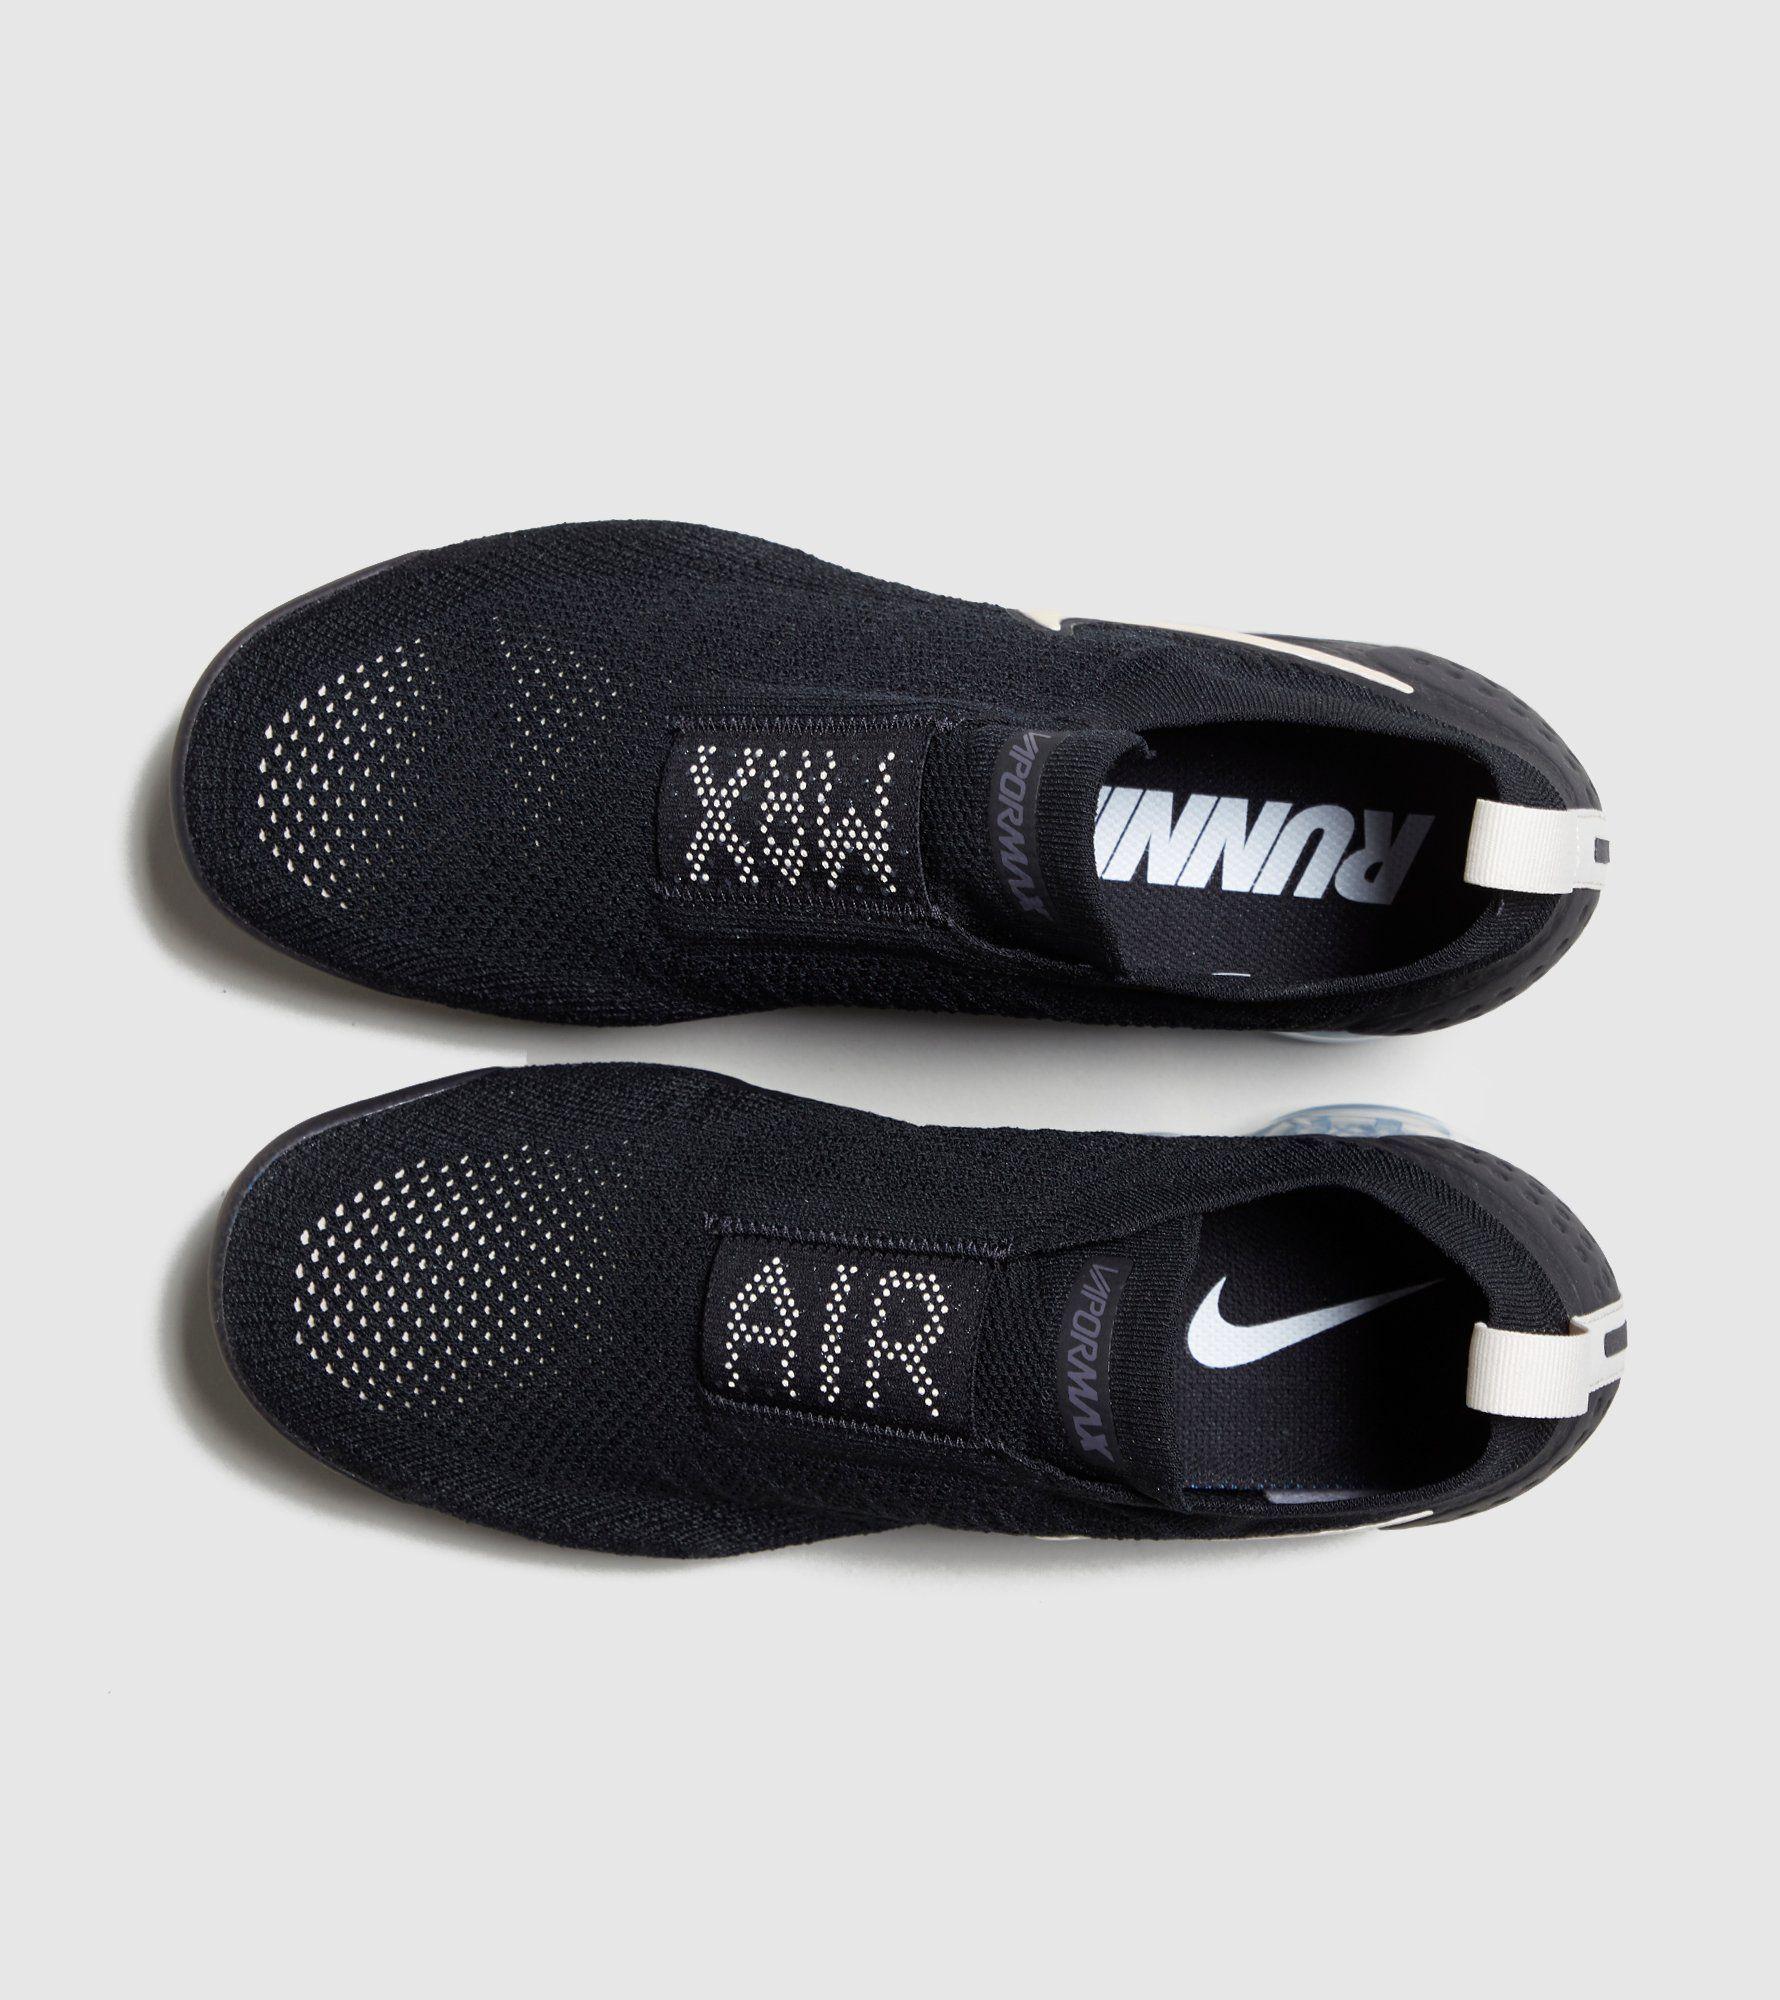 Nike Air VaporMax Moc 2